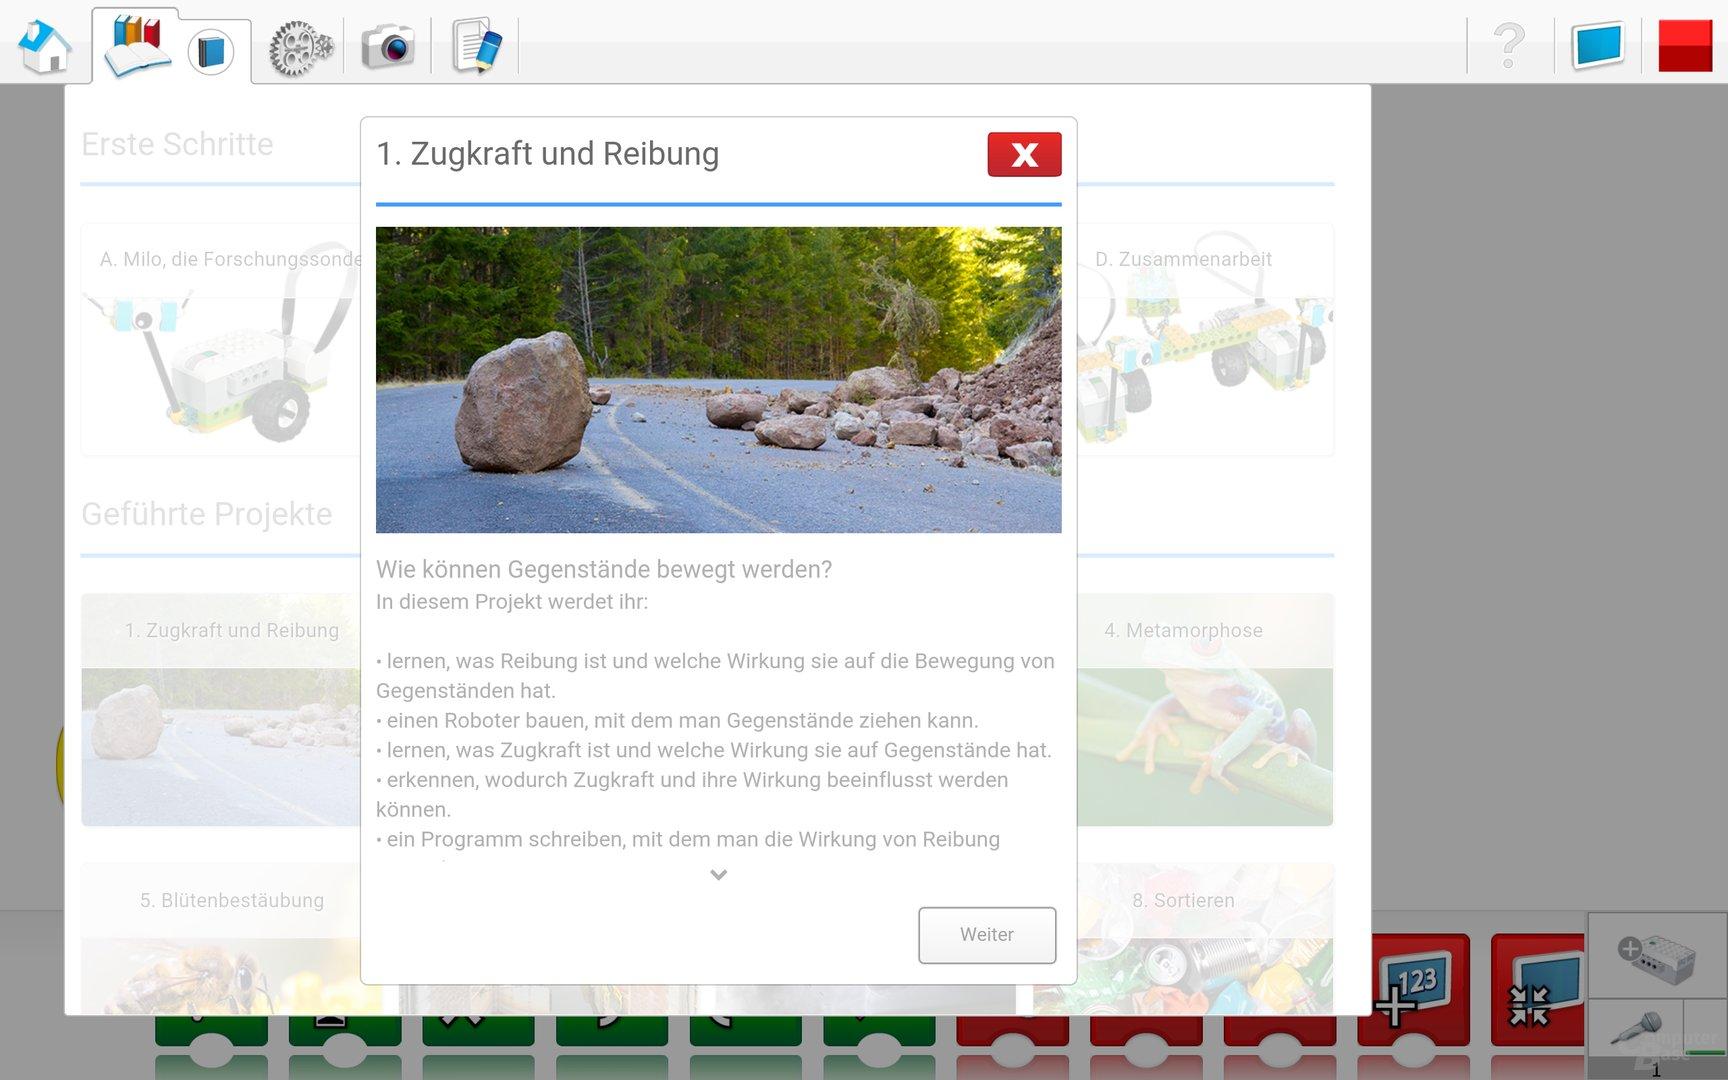 Lego WeDo 2.0 Android App – Projektinformationen